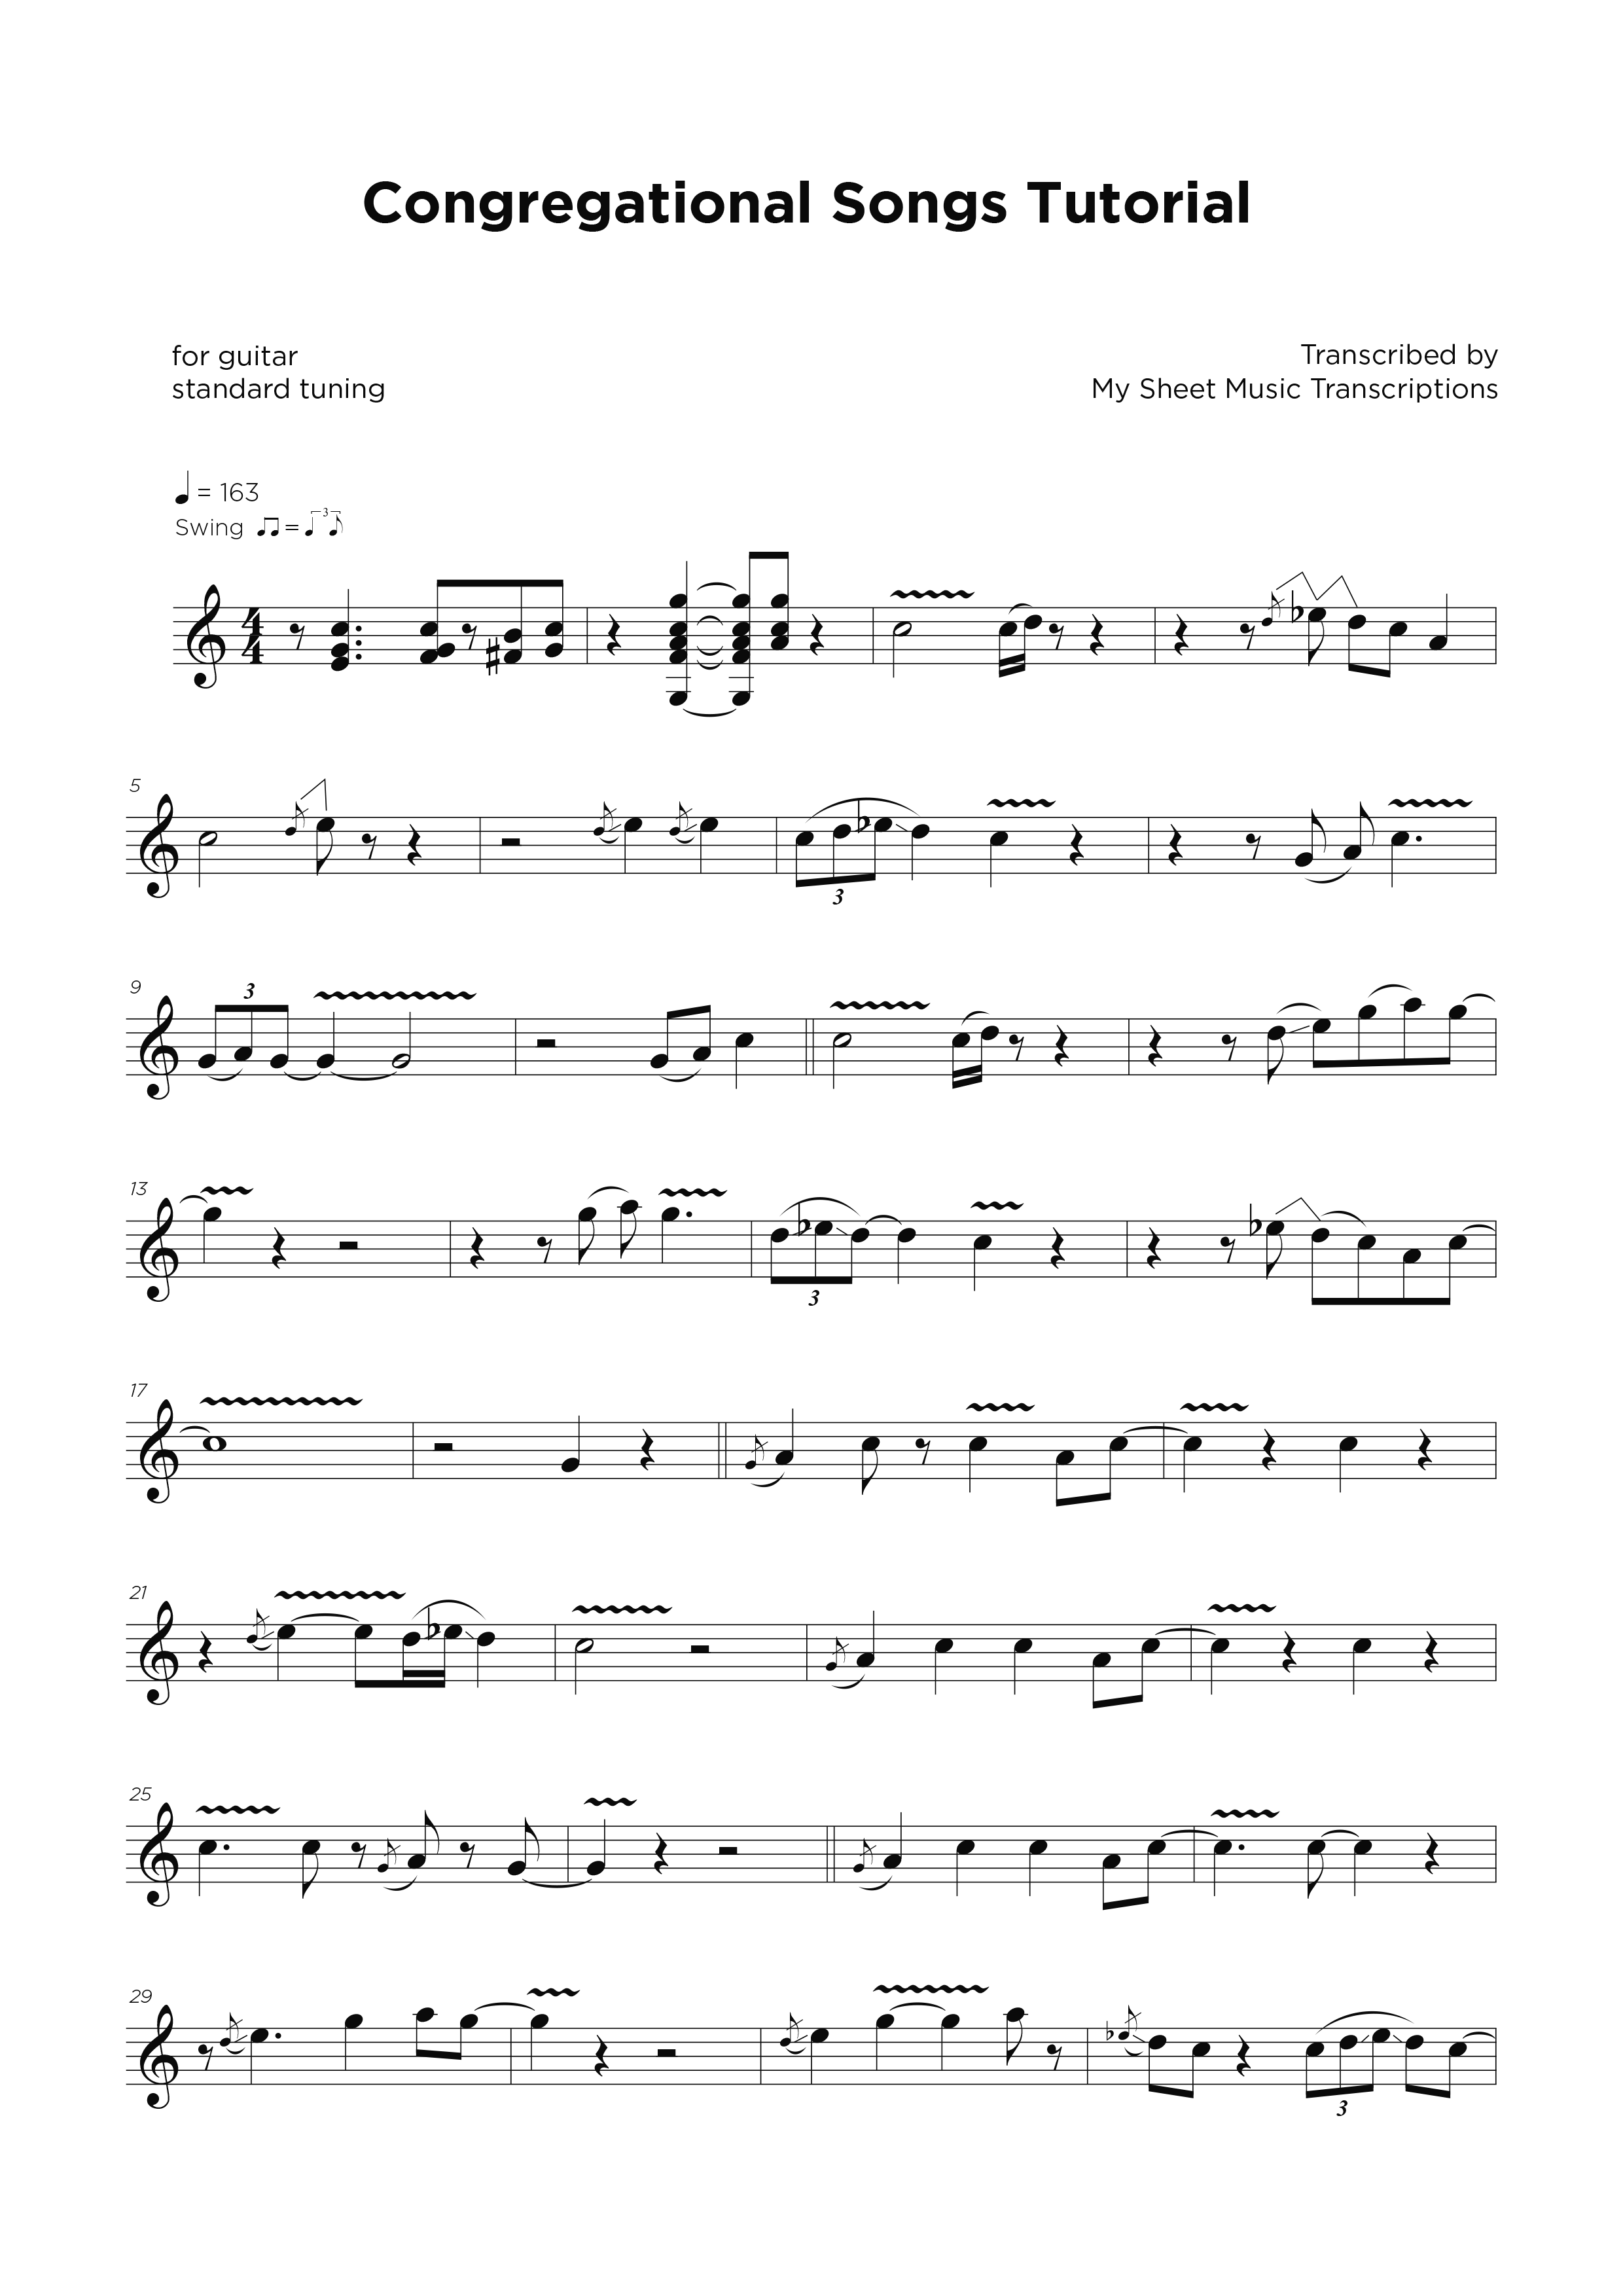 Congregational Songs tutorial - Guitar sheet transcription service